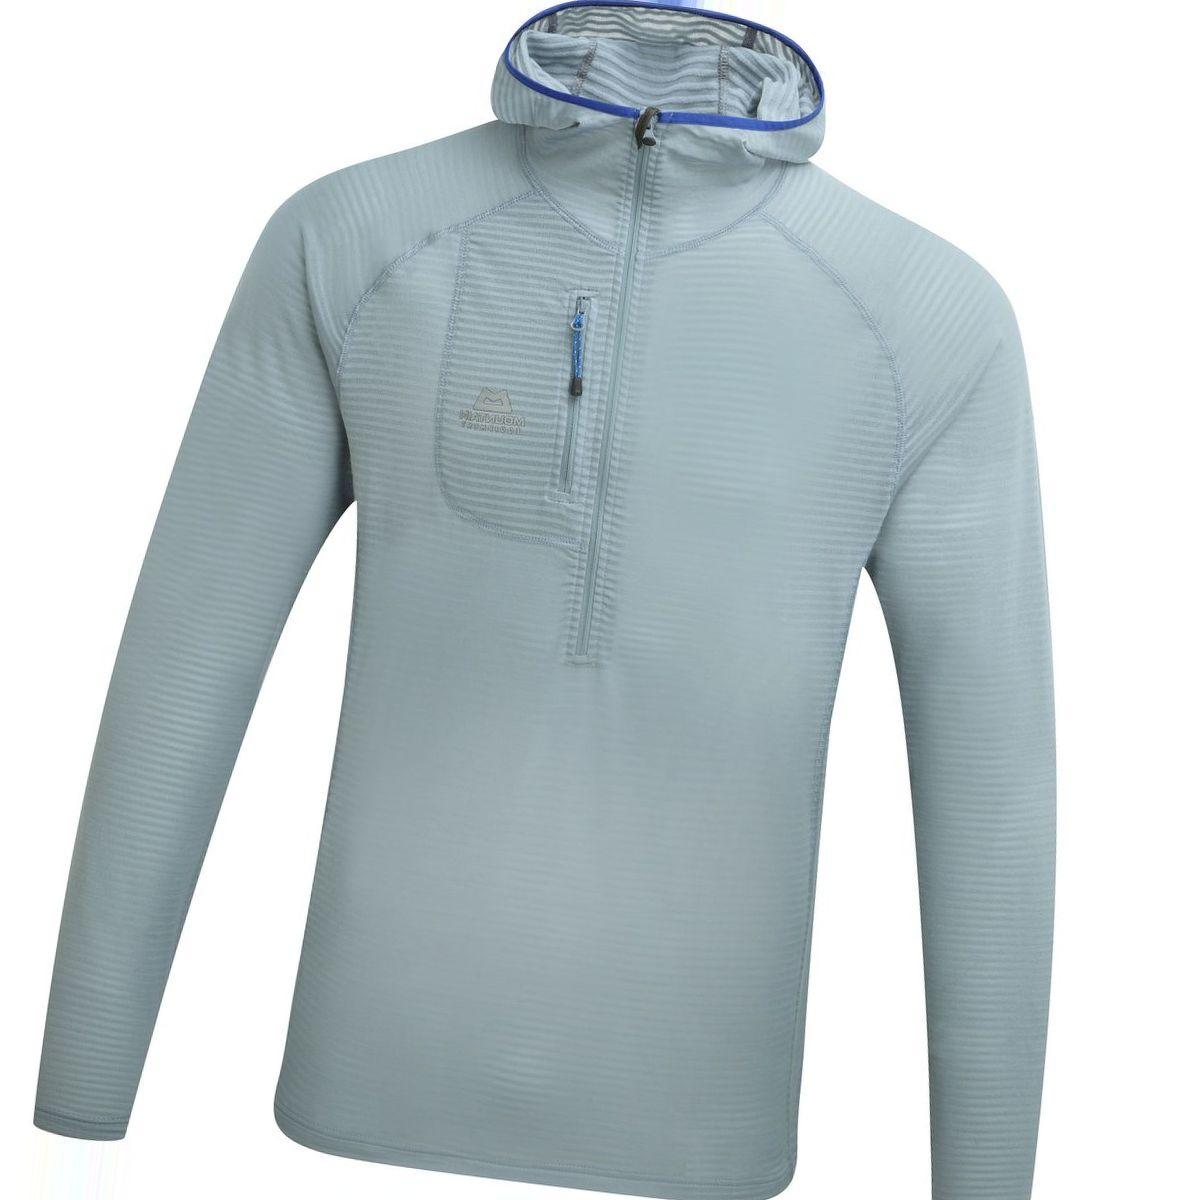 Mountain Equipment Solar Eclipse Hooded Zip T-Shirt - Men's